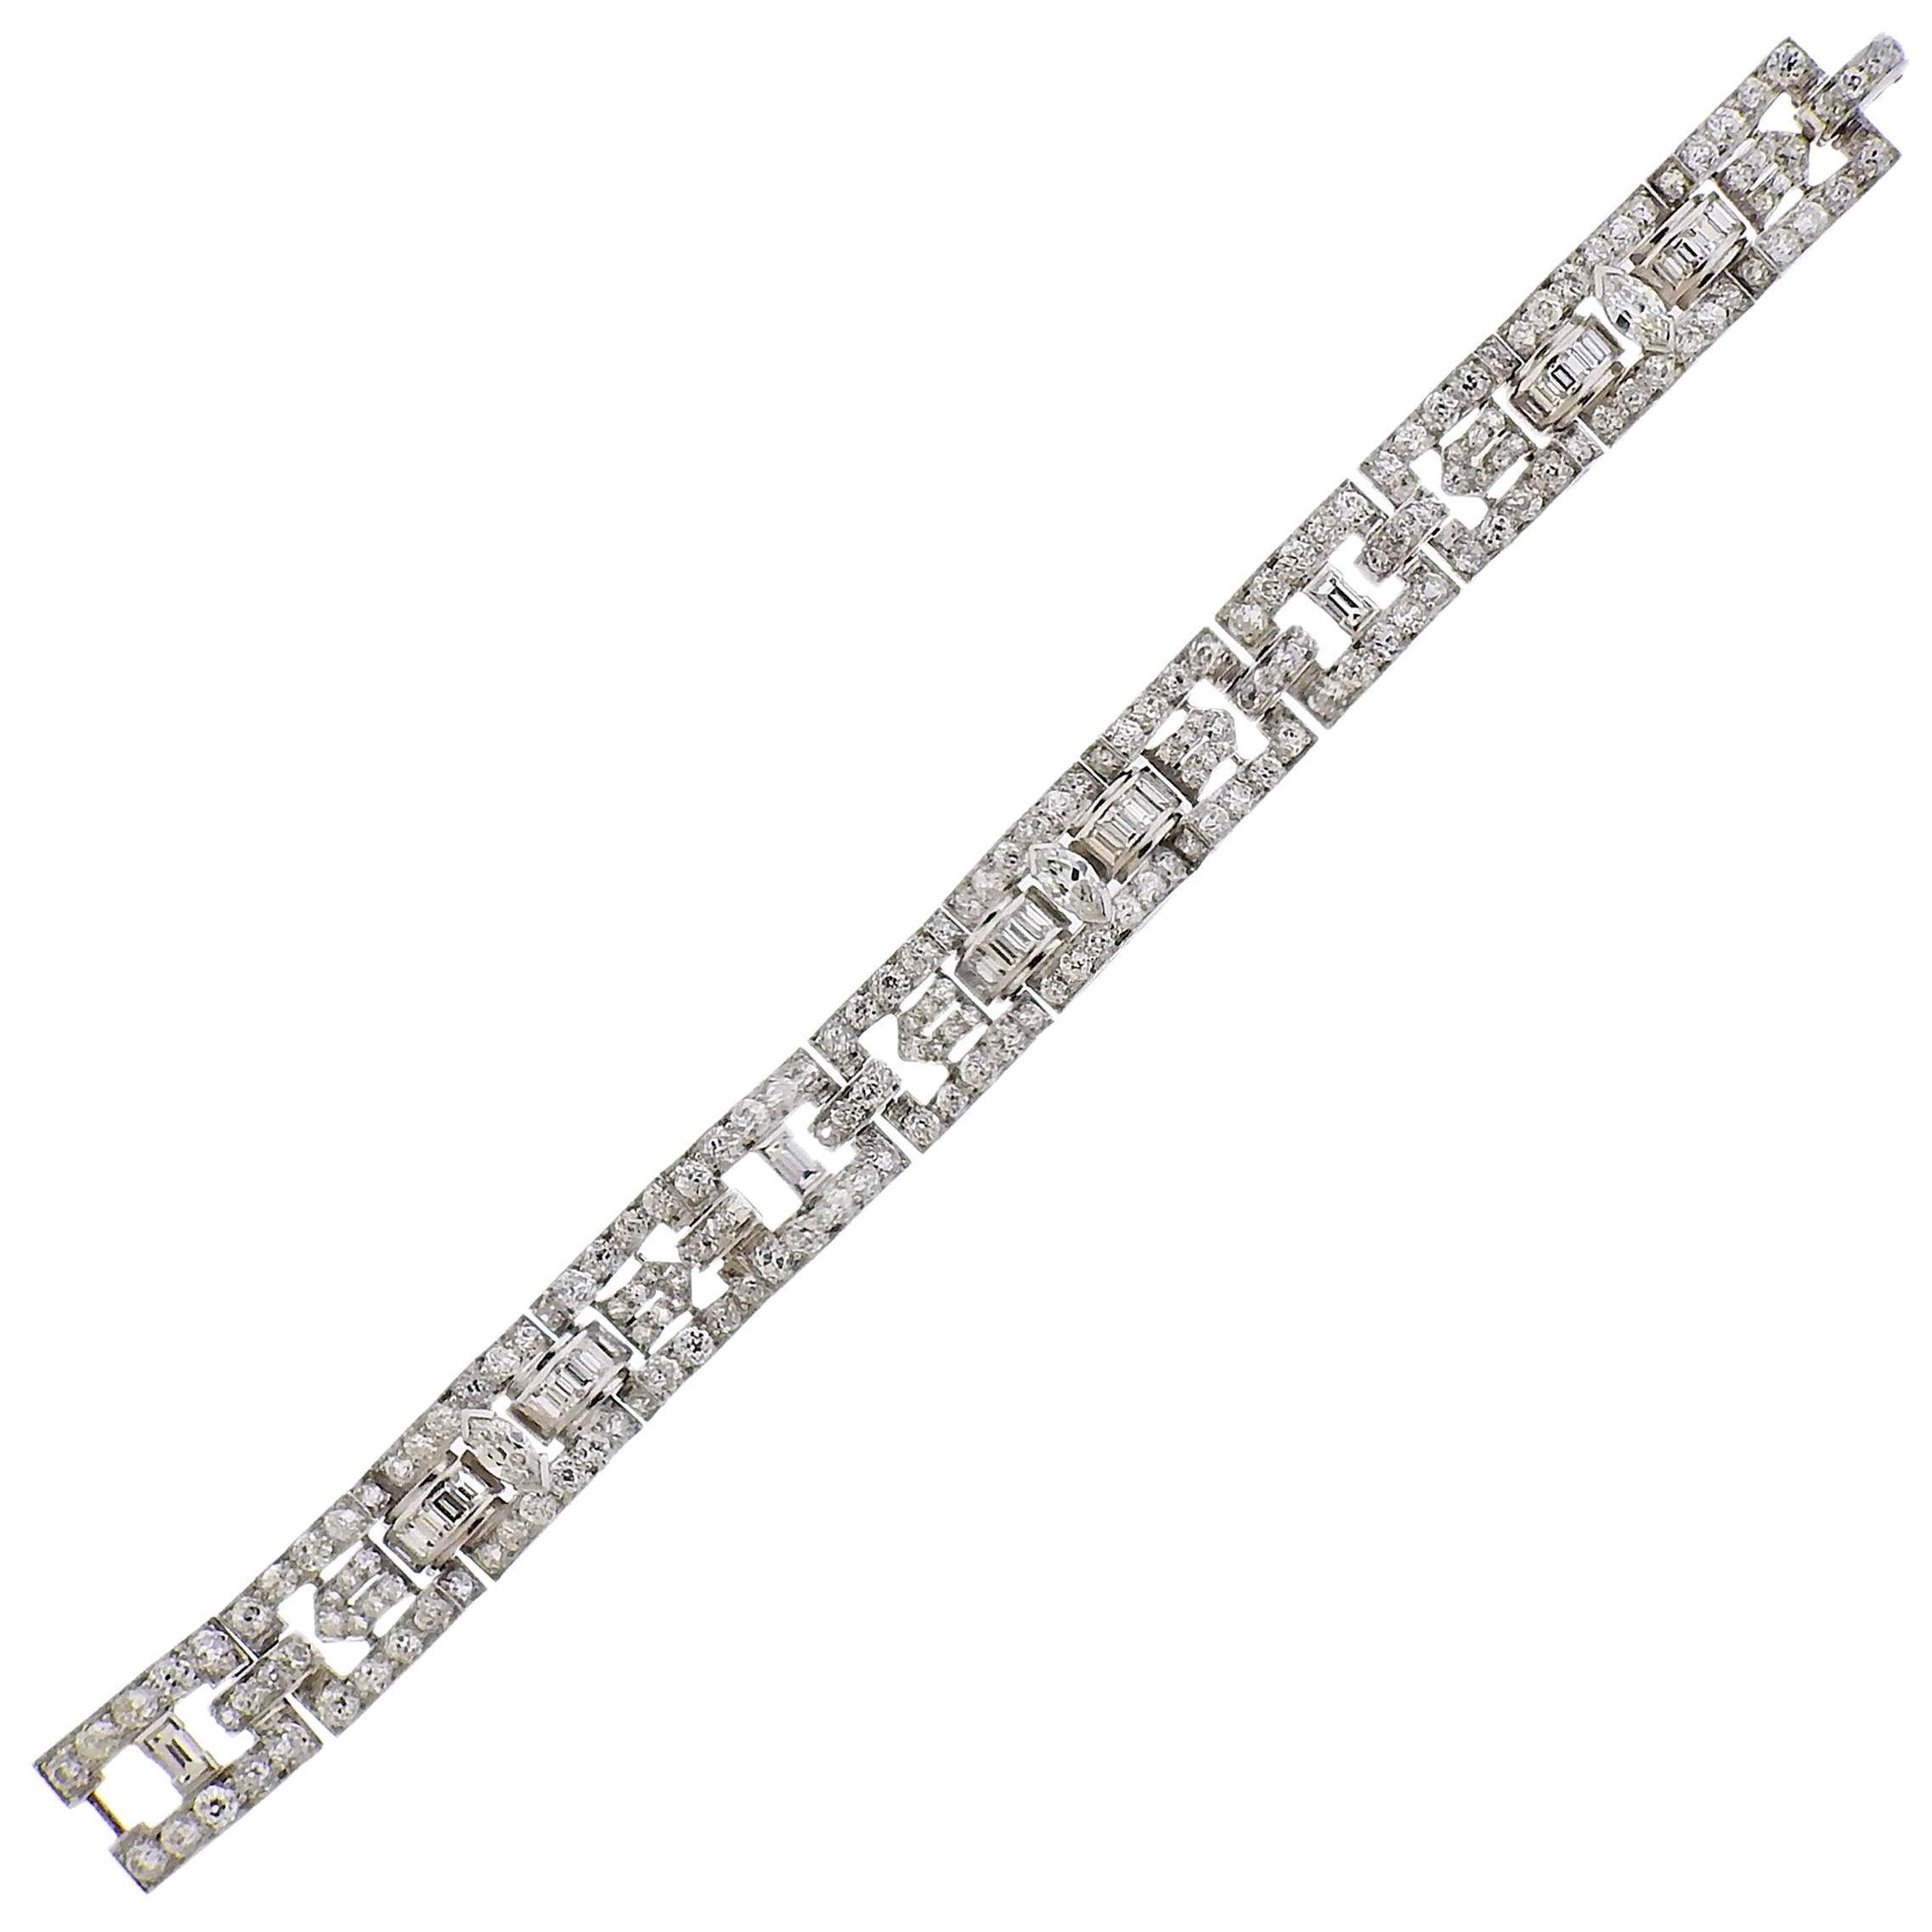 Cartier Art Deco 12 Carat Diamond Platinum Bracelet